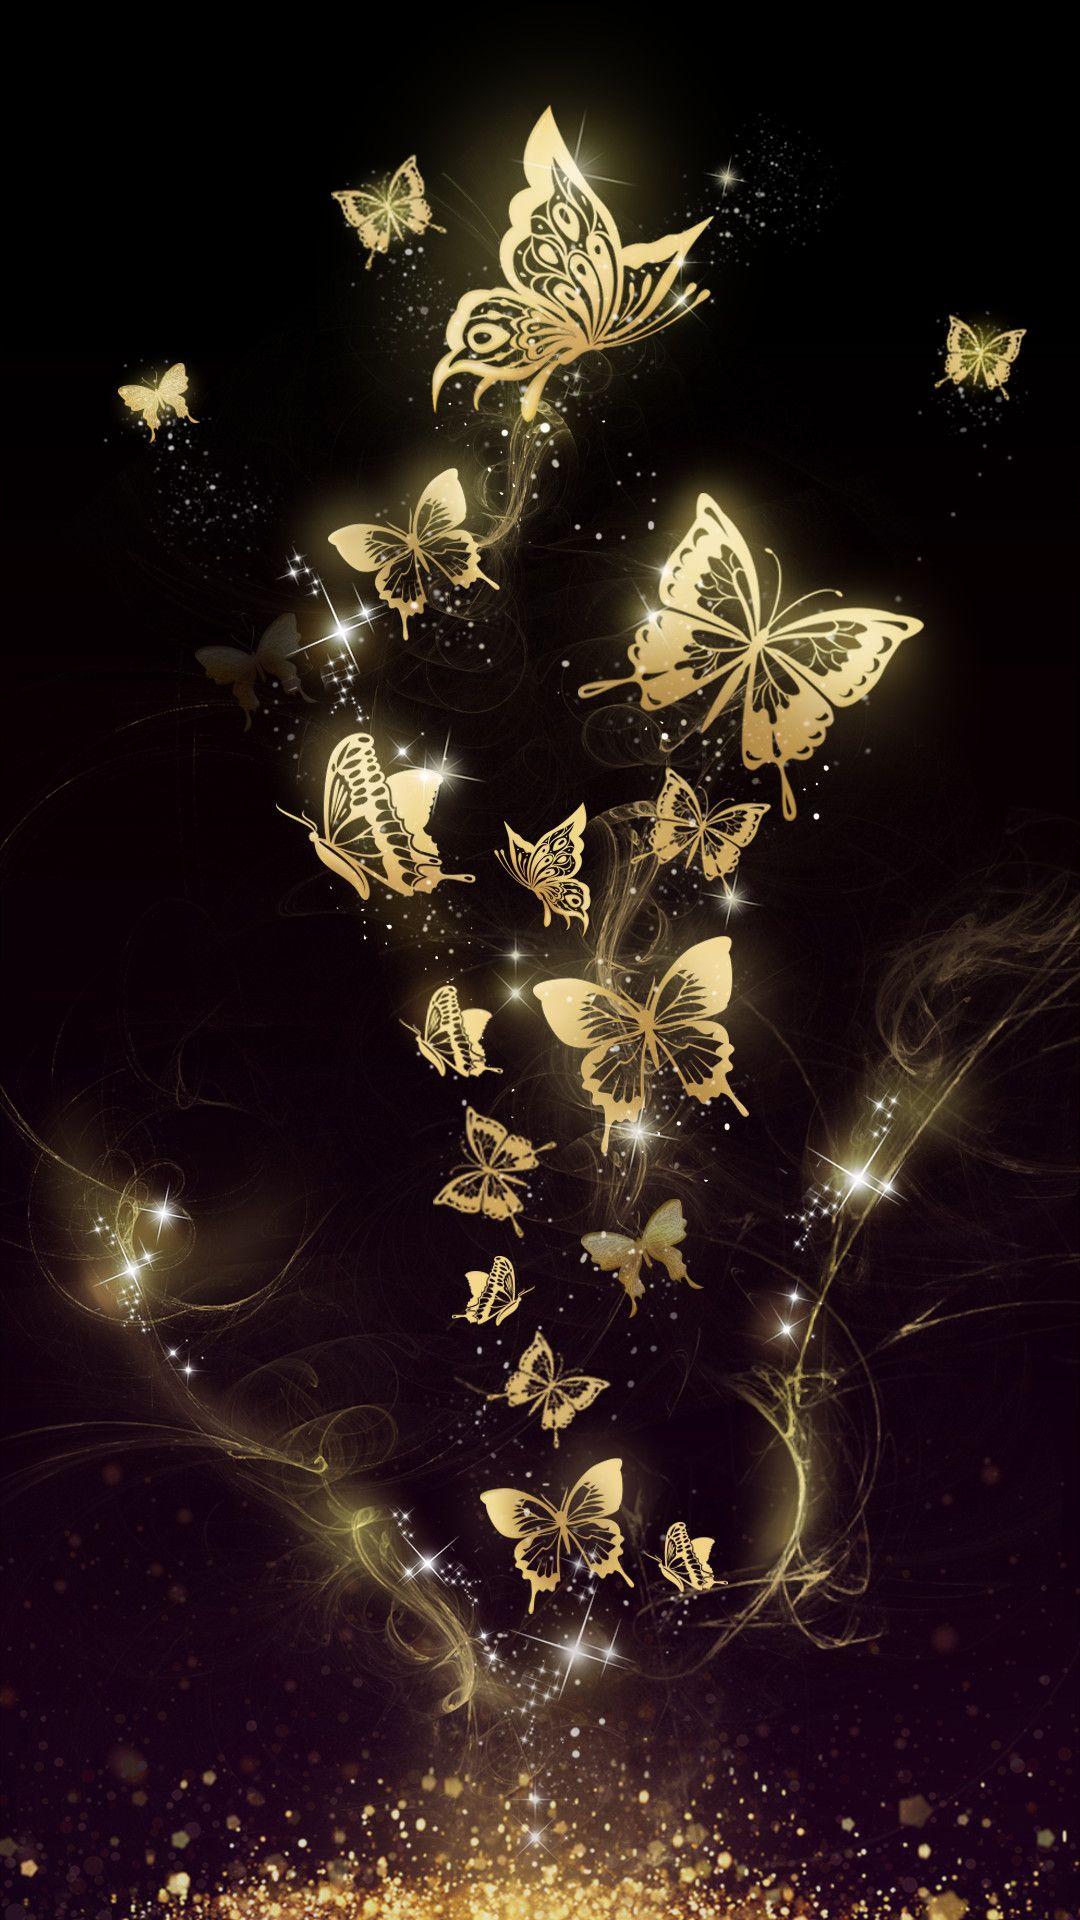 Dark Butterfly Anime Girl Wallpapers - Wallpaper Cave